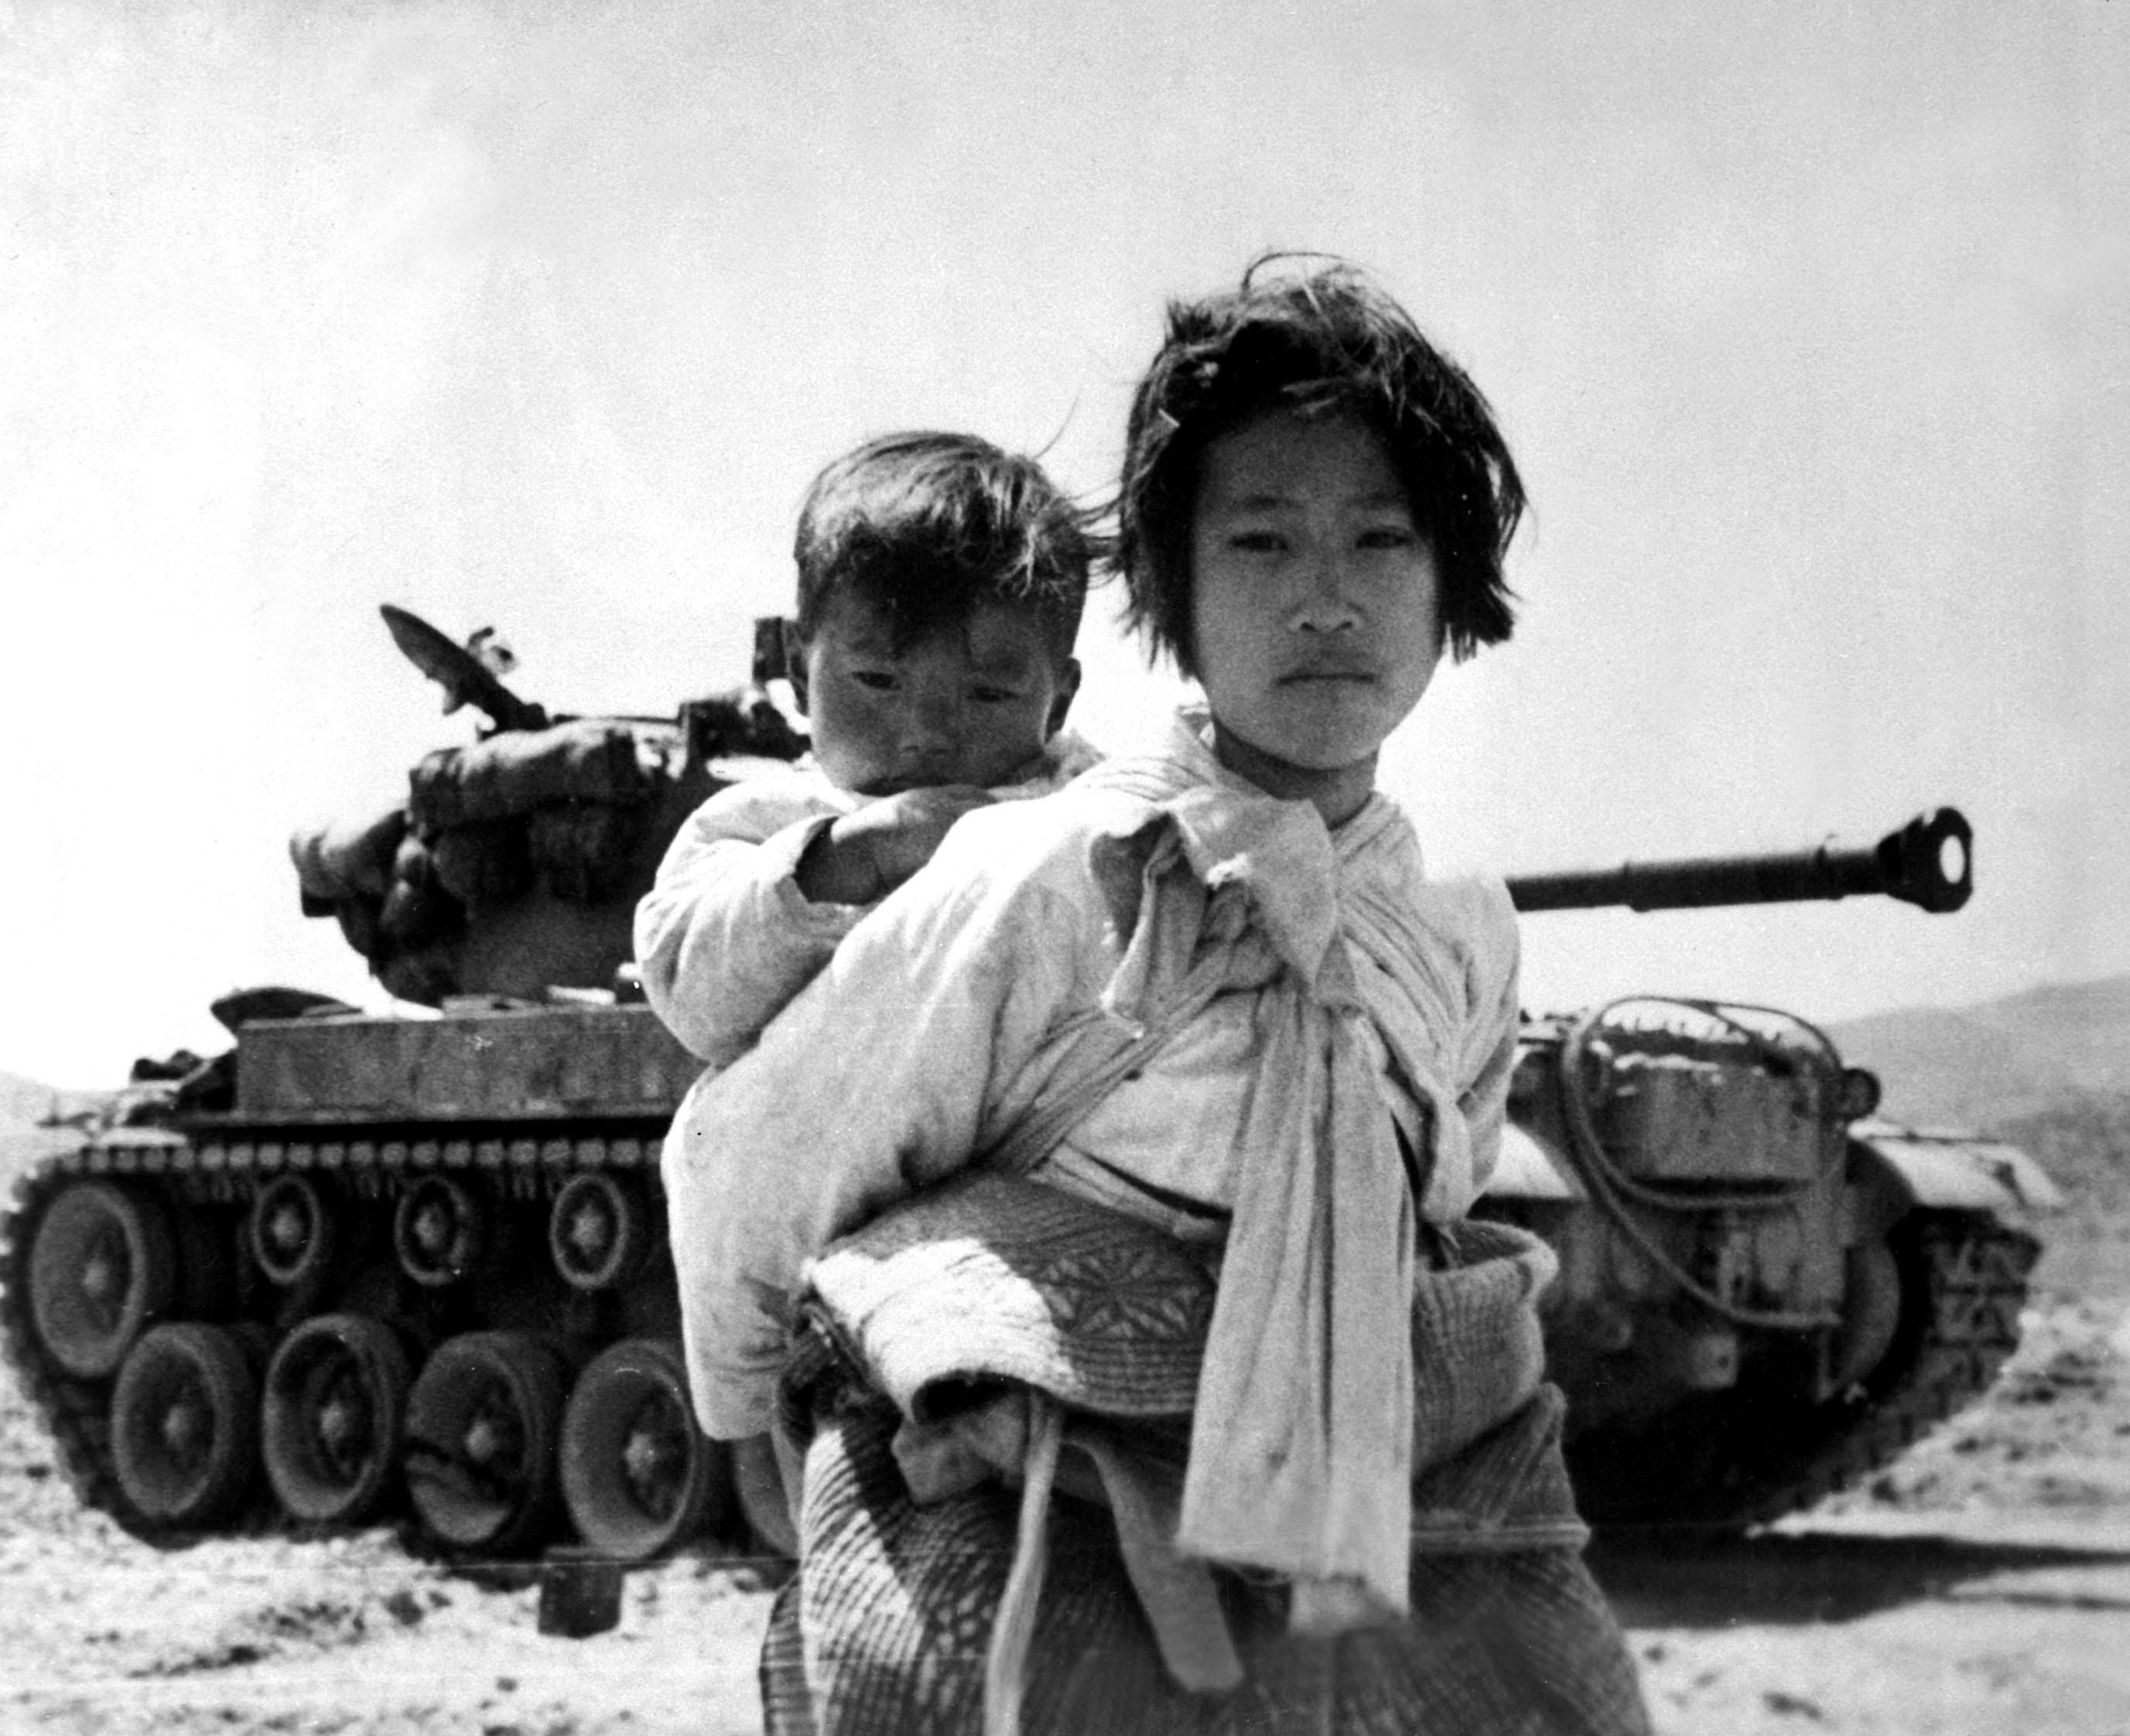 WAR & CONFLICT BOOKERA:  KOREAN WAR/CIVILIANS & REFUGEES